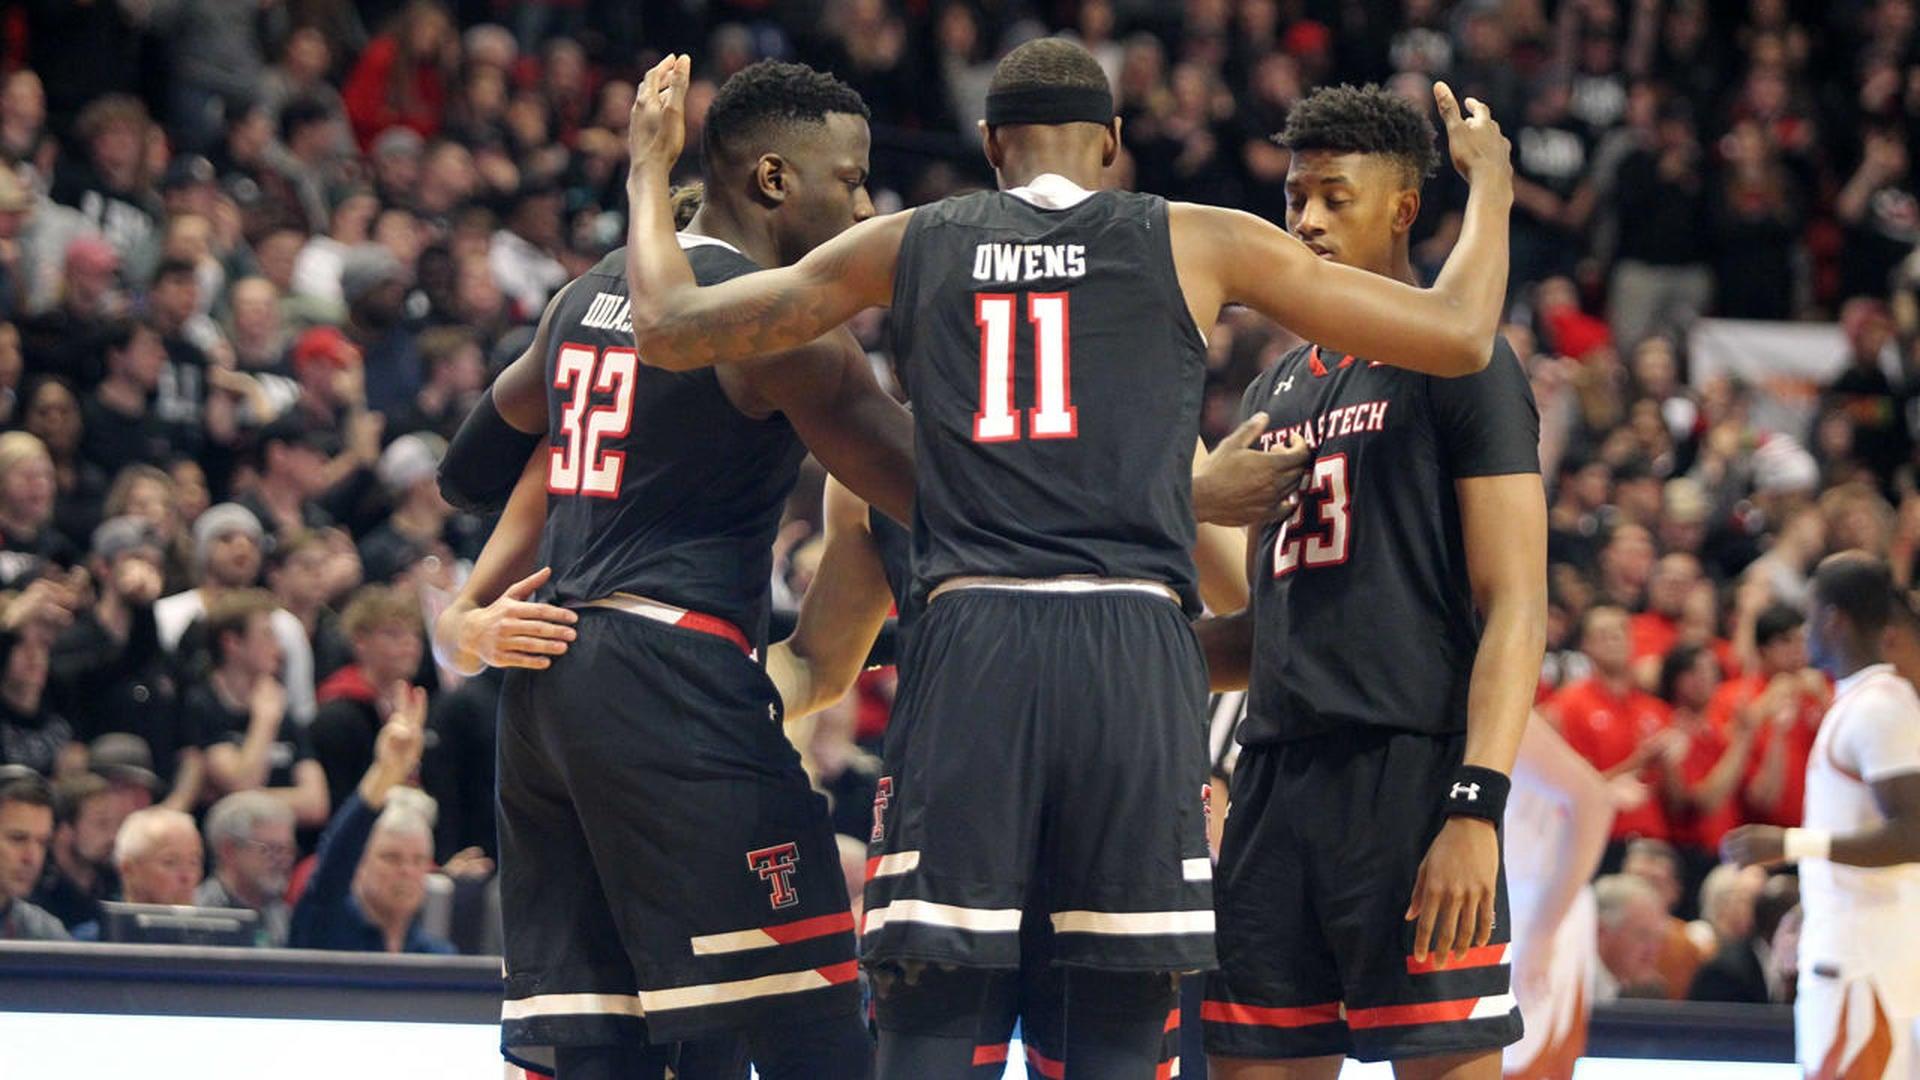 2019 NCAA Tournament: Texas Tech vs. Northern Kentucky odds, picks, predictions from model on 11-5 run